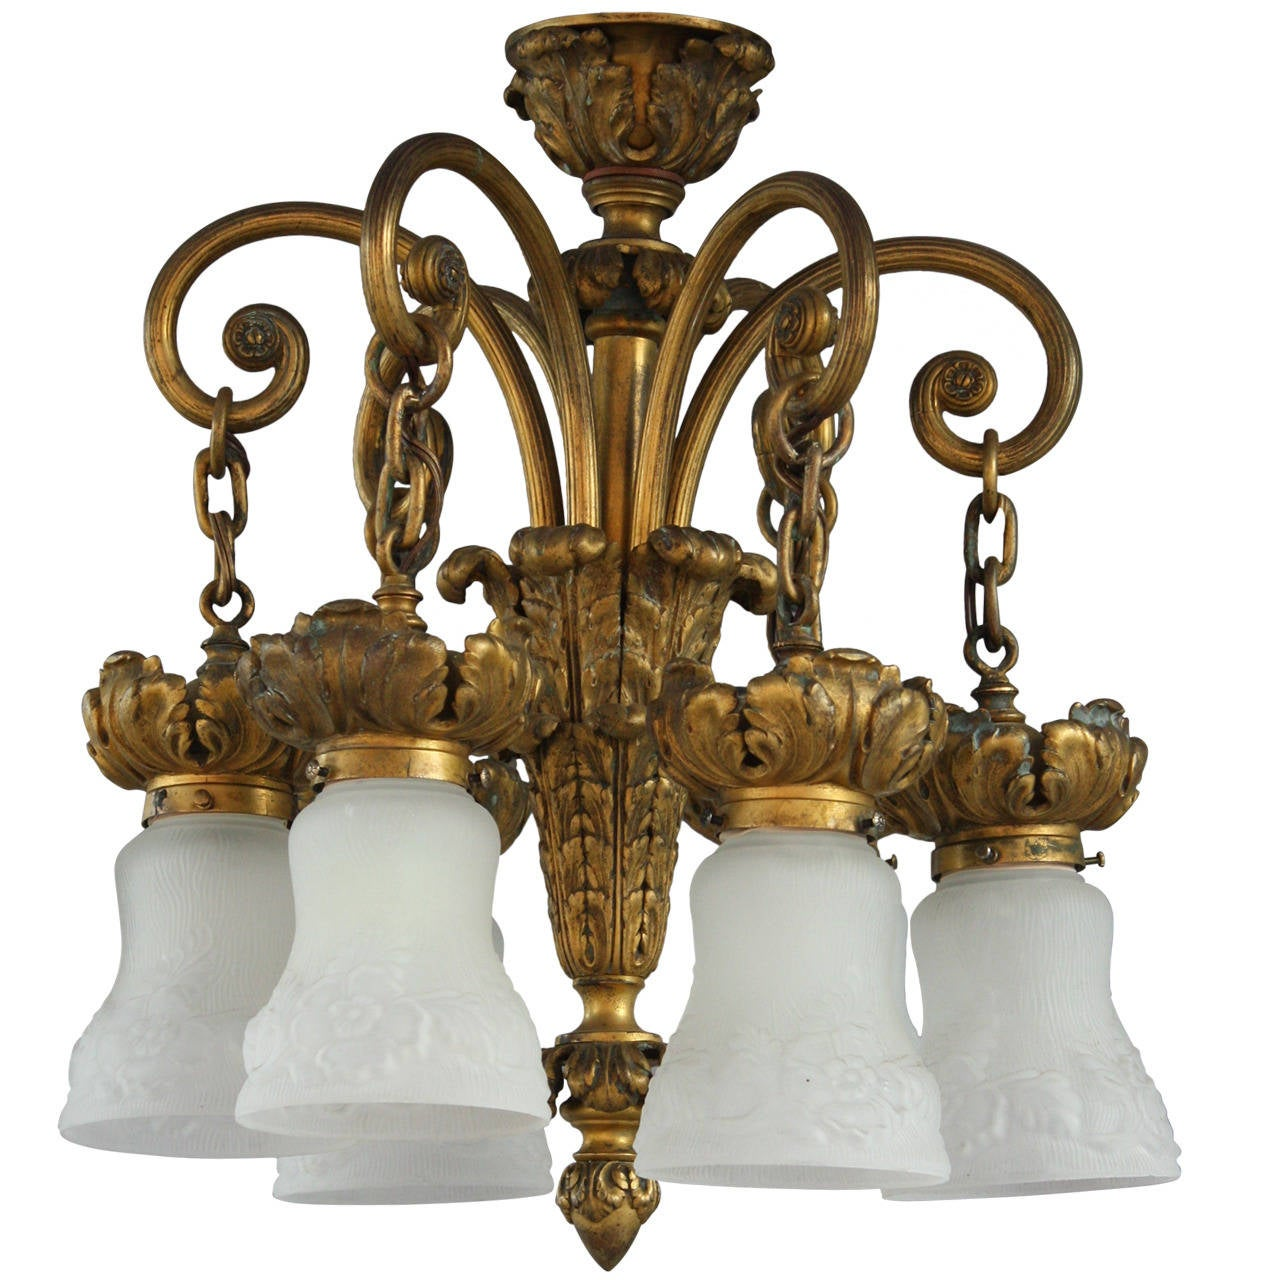 Antique 1920s bronze chandelier with acanthus motif and shallow antique 1920s bronze chandelier with acanthus motif and shallow drop 1 arubaitofo Gallery